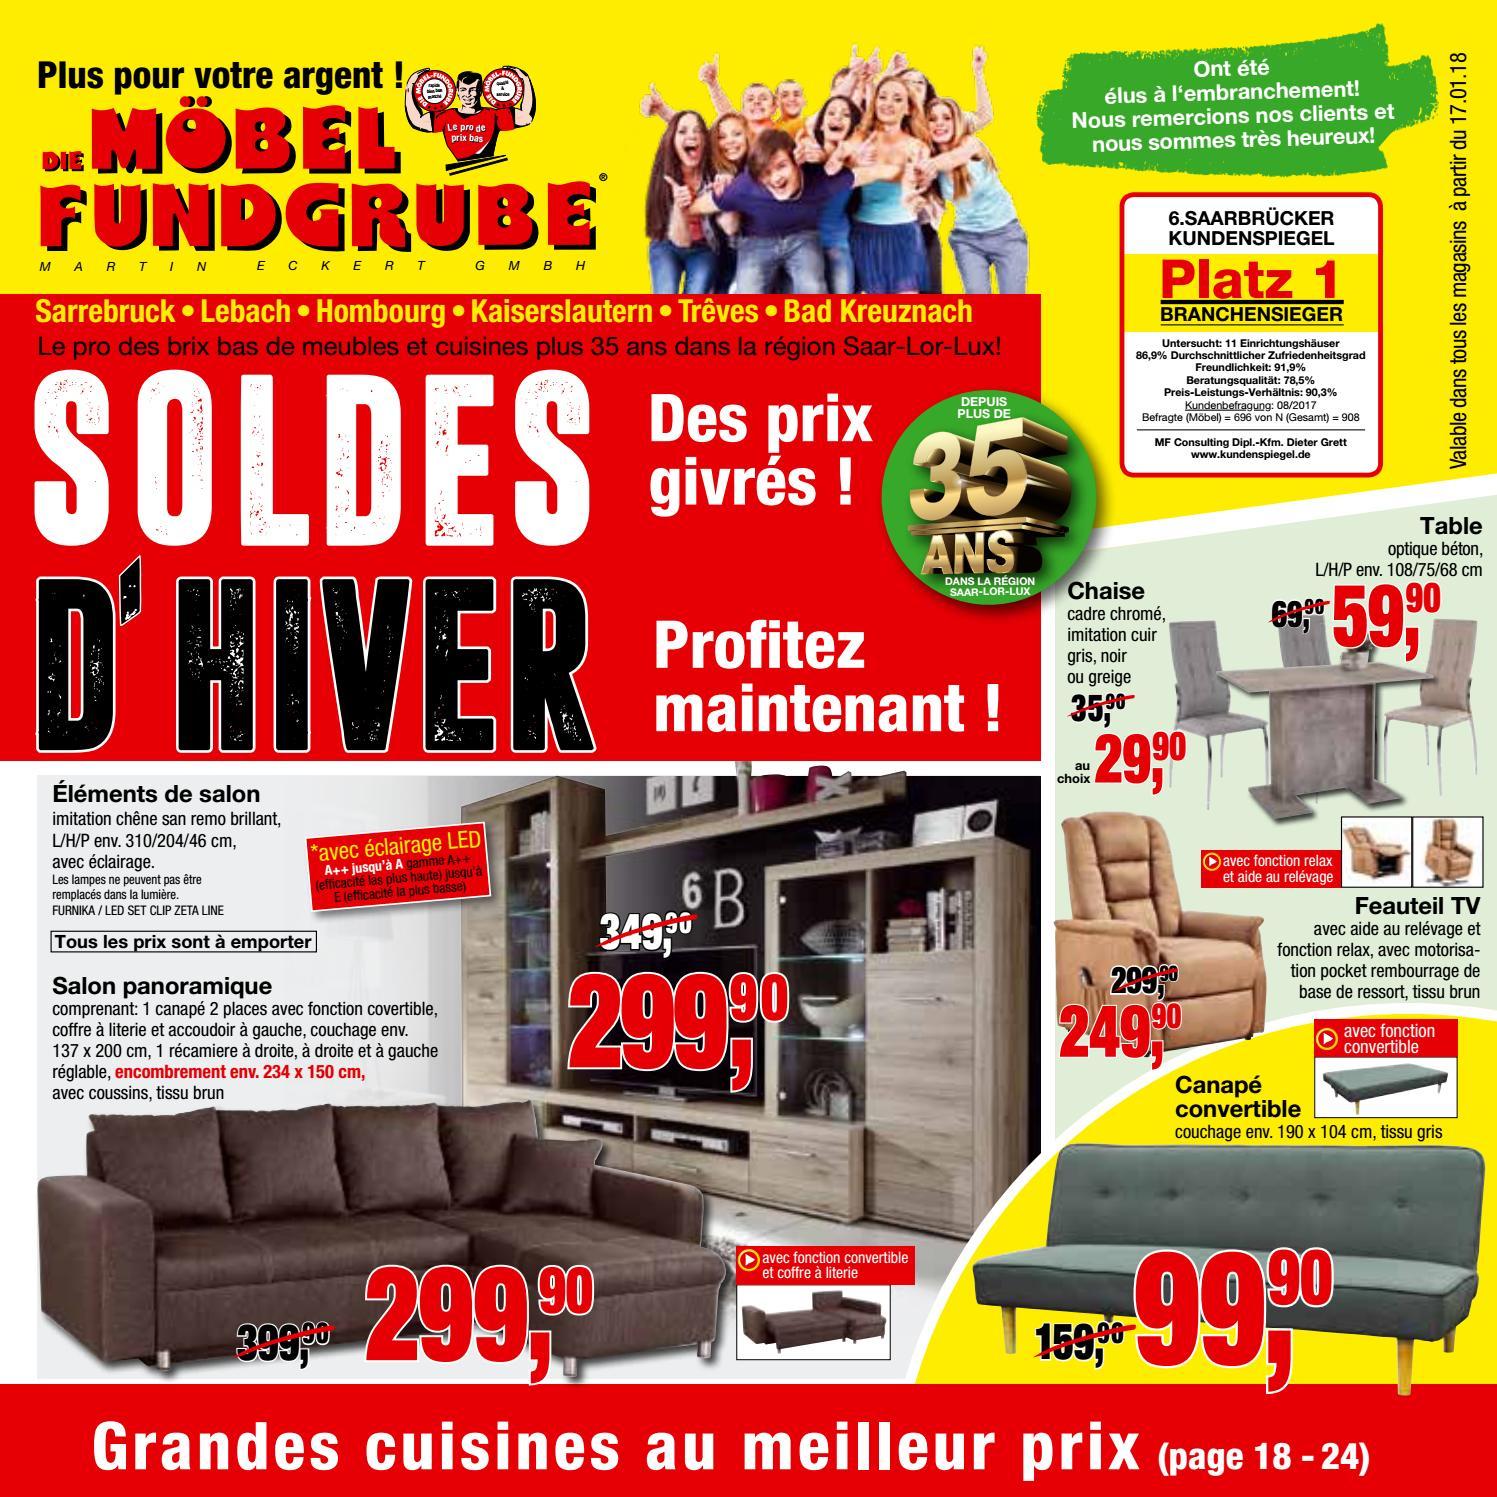 Möbel Fundgrube Prospekt Kw 03 Francais By Die ... à Moebel Fundgrube